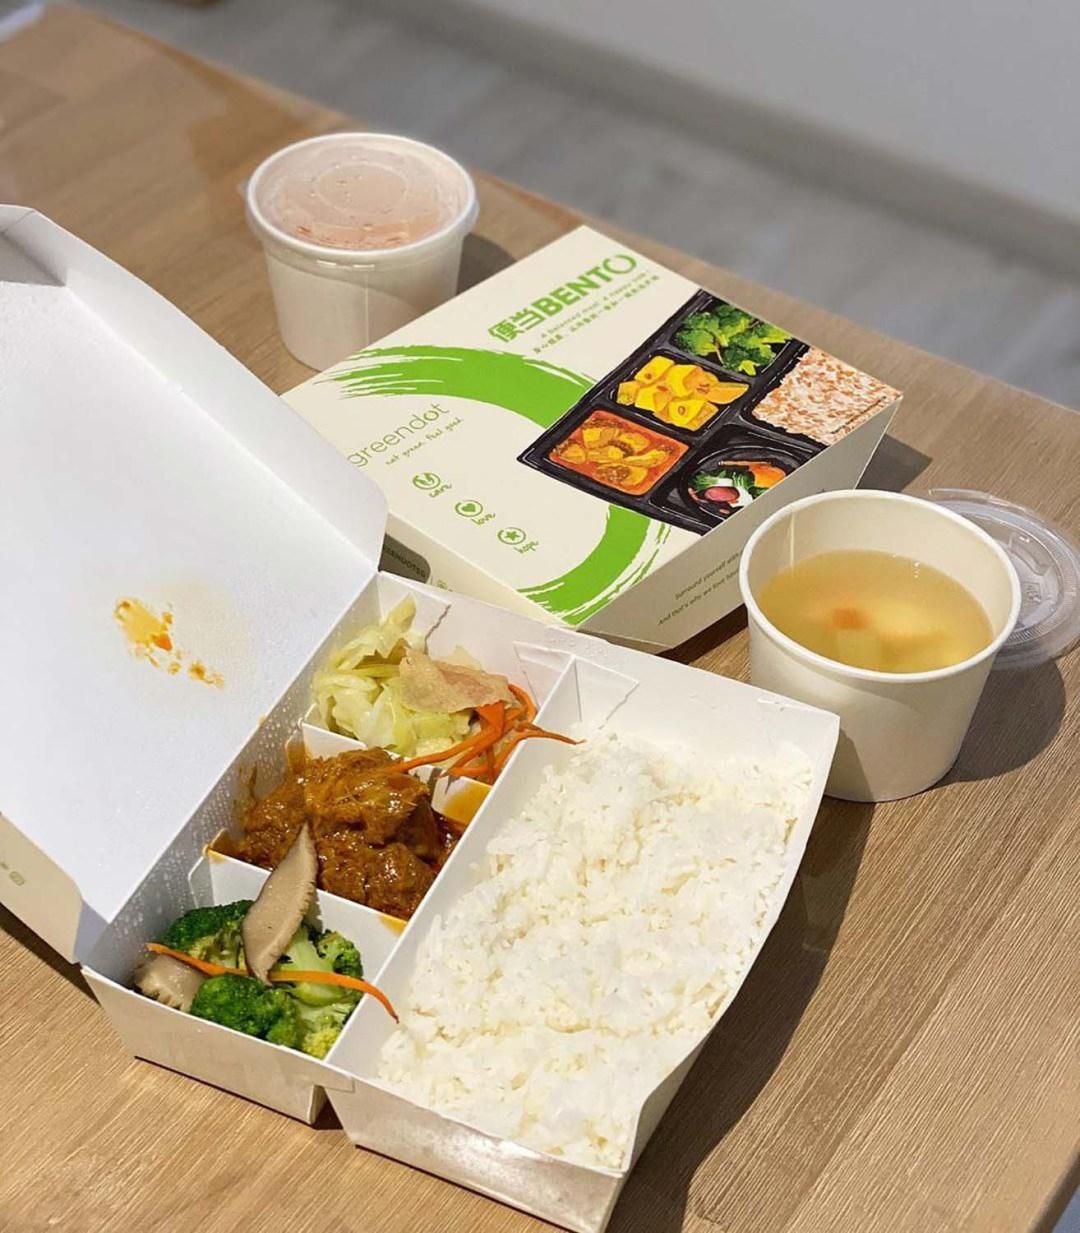 Healthy Food Delivery - Greendot